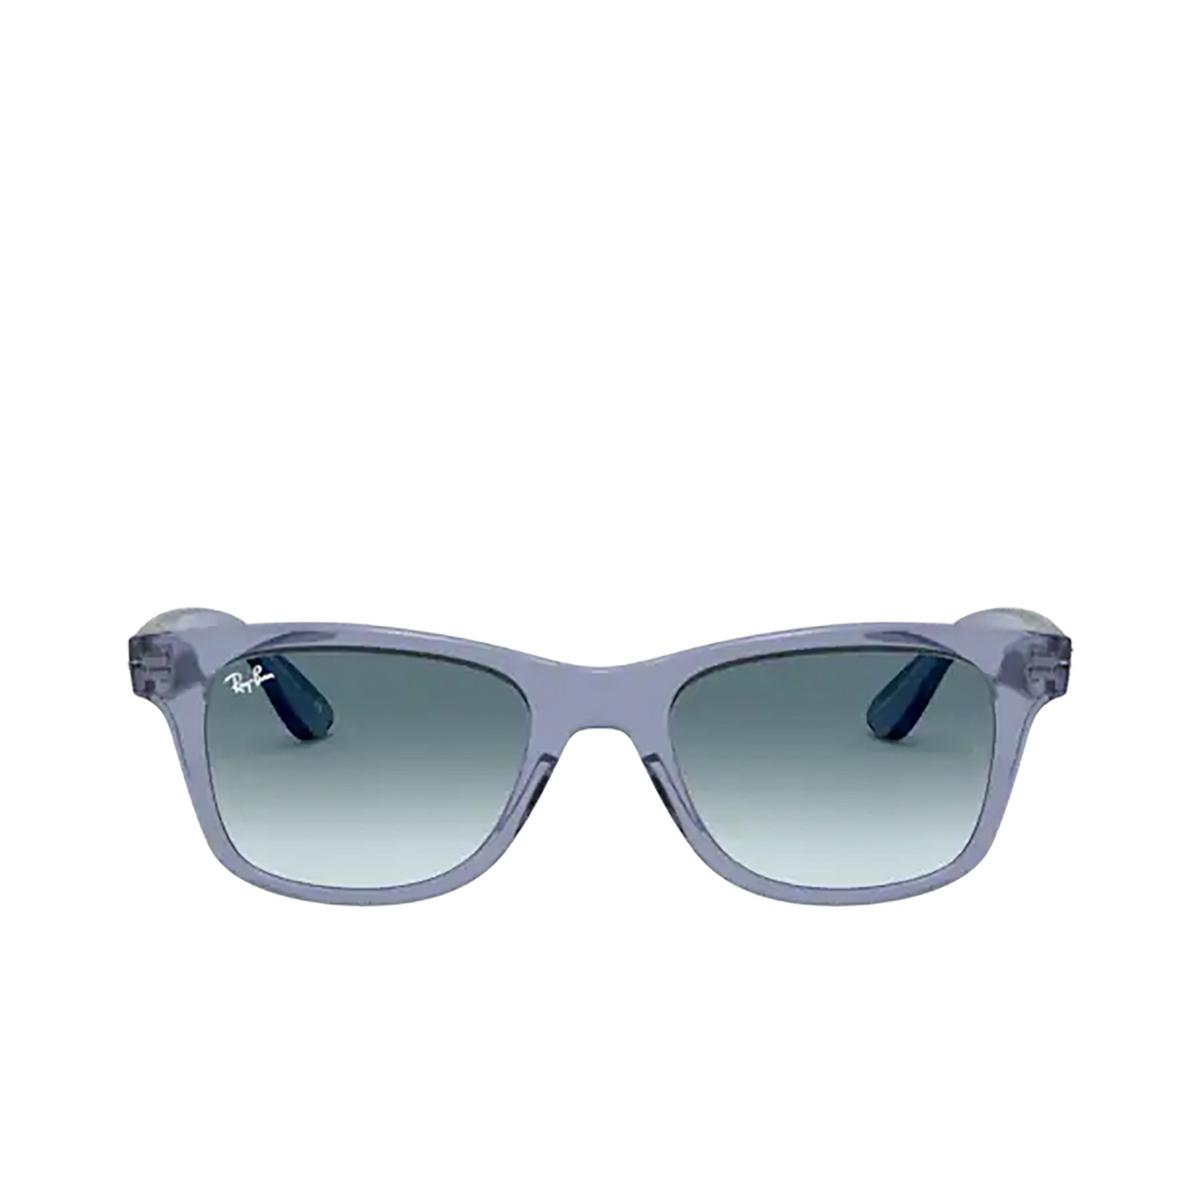 Ray-Ban® : RB4640 color Transparent Blue 64963M.